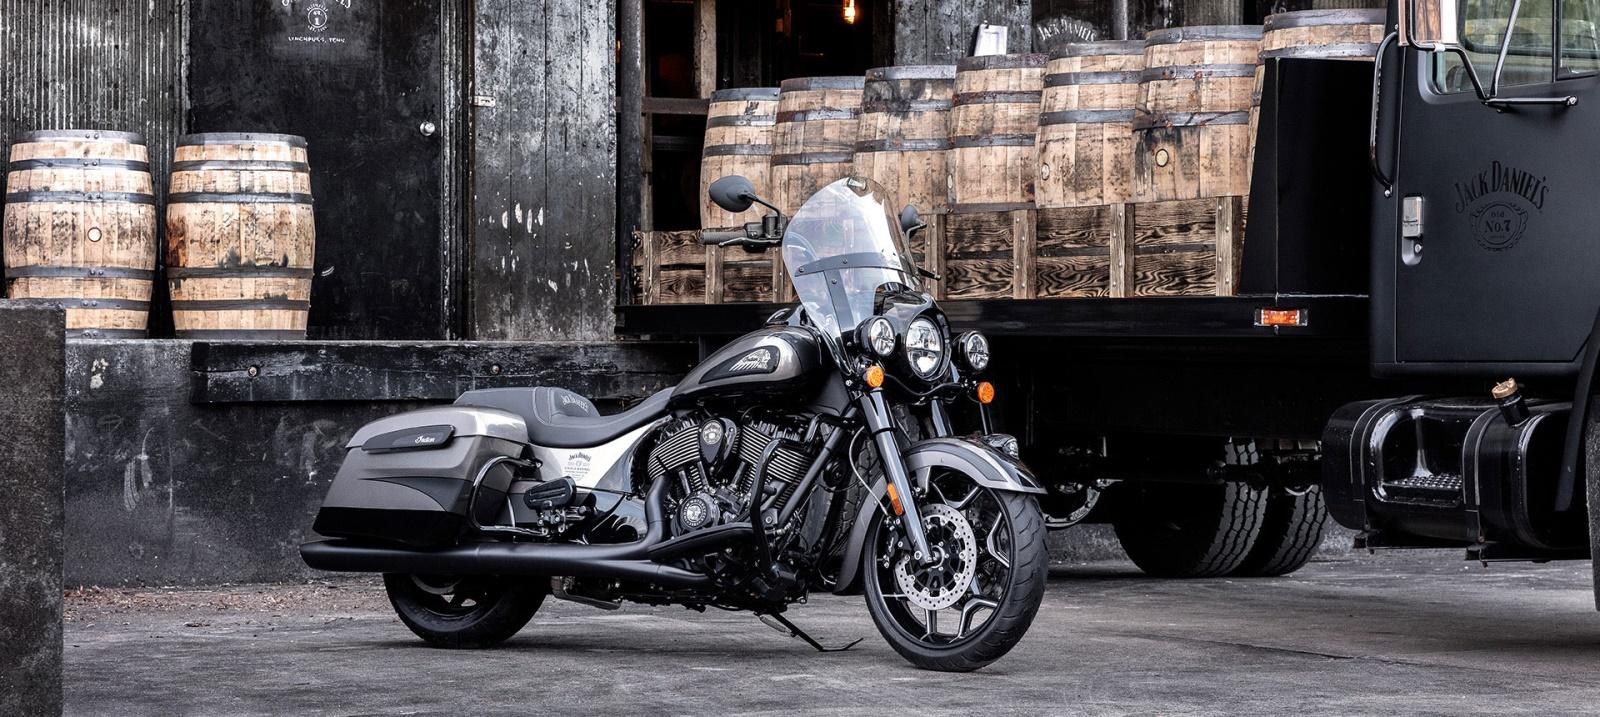 Indian Springfield Dark Horse Jack Daniel`s Limited Edition-2